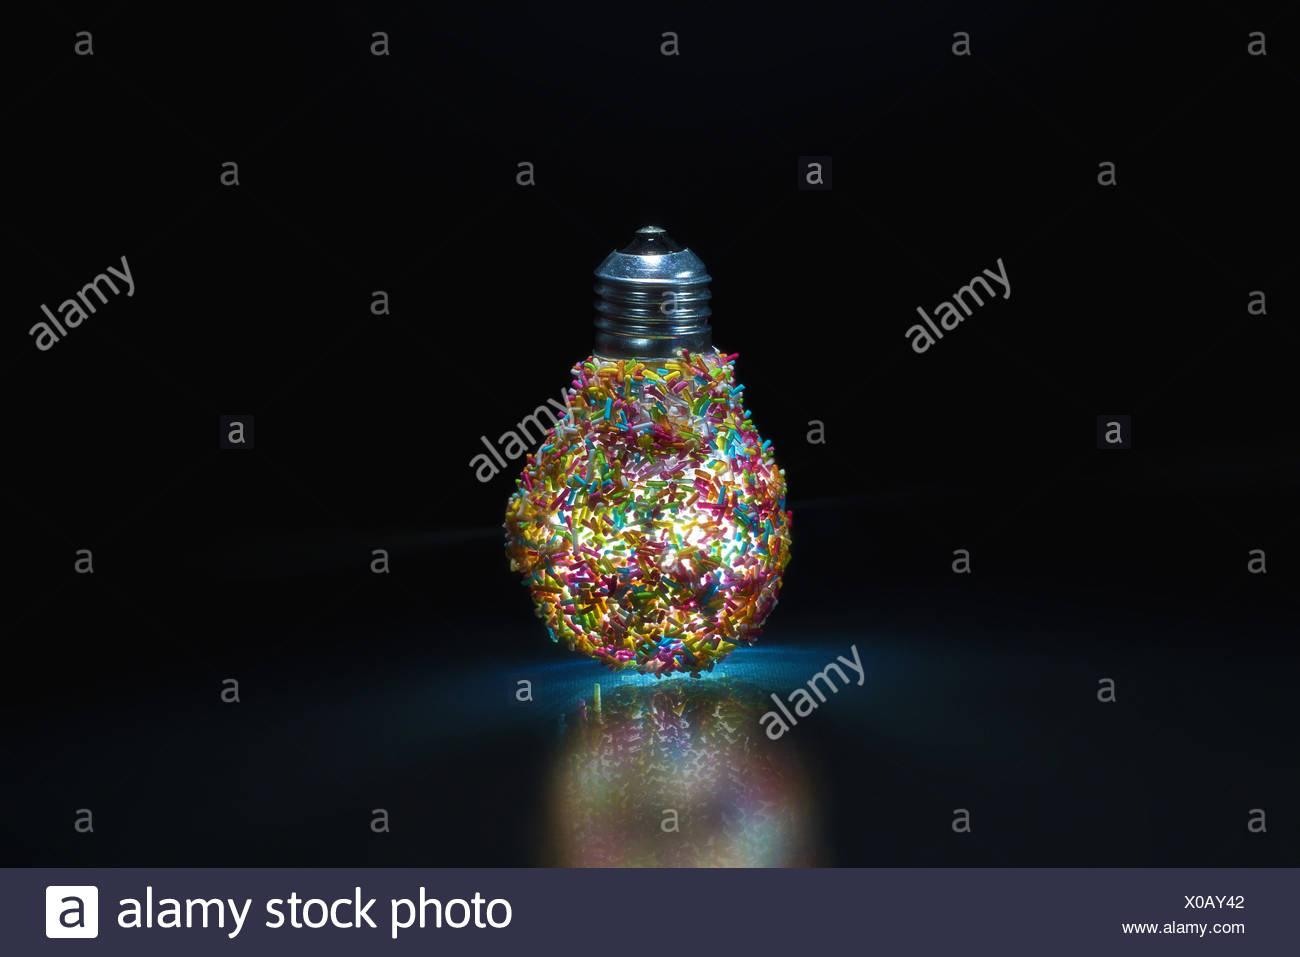 Decorative light bulb - Stock Image